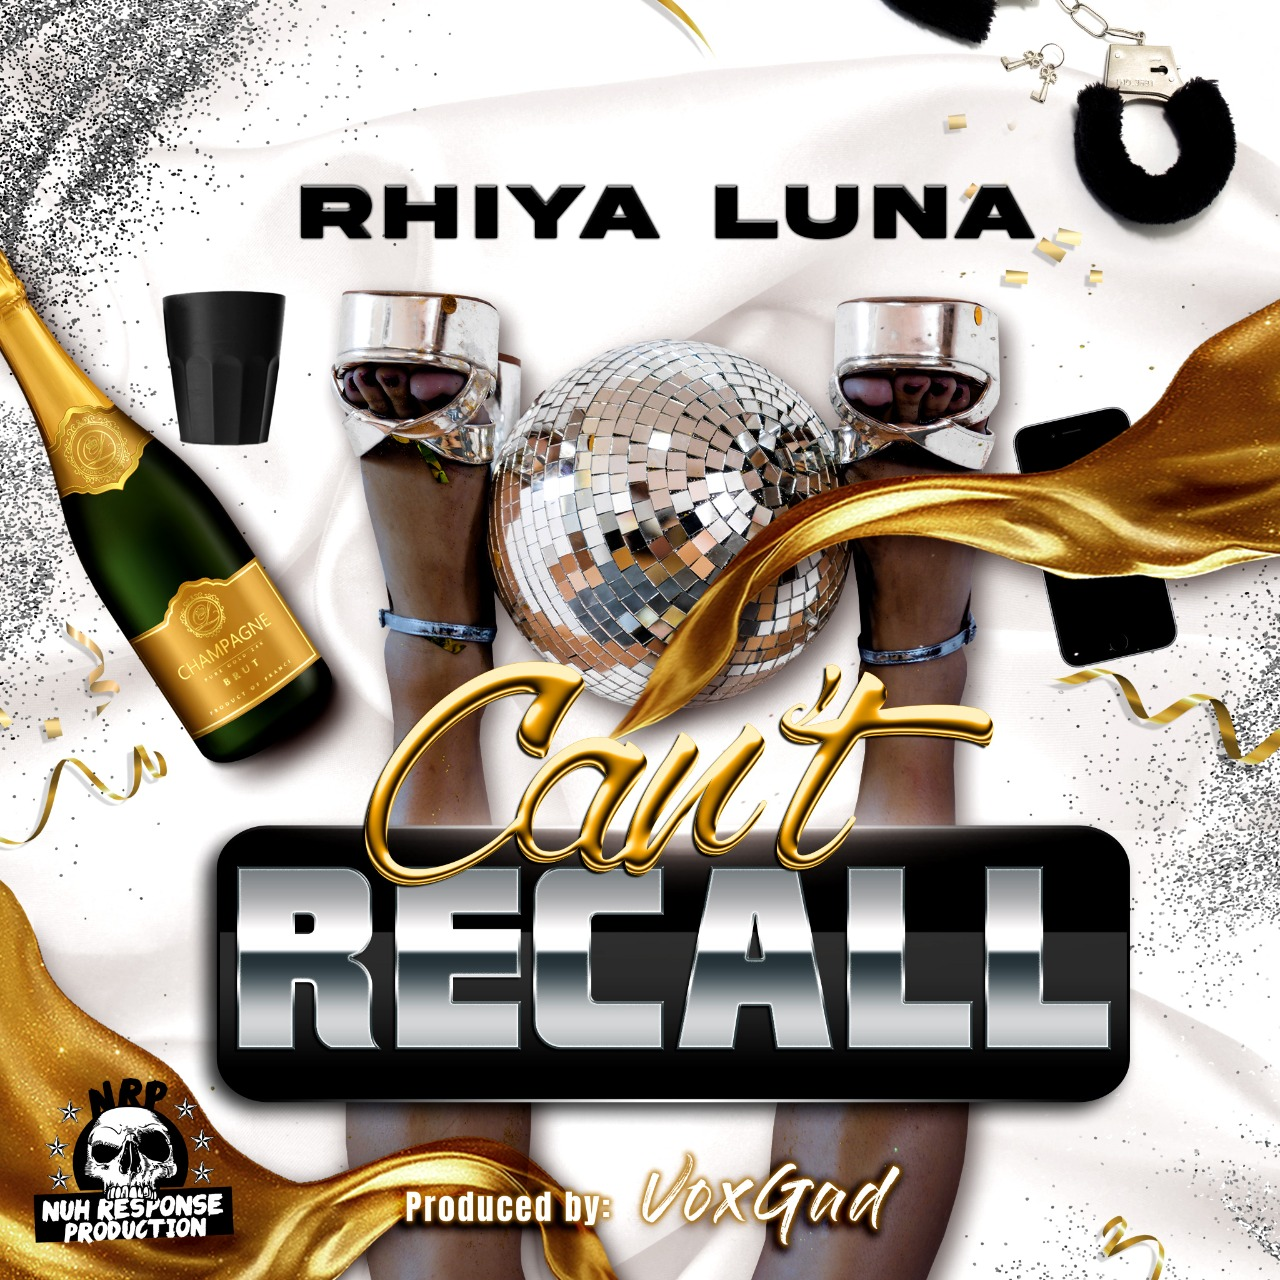 Jamaica Boston Dancehall Music 13thStreetPromo 13thStreetPromotions Rhiya Luna Can't Recall Drunk Party Caribbean Singer Vox Gad Nuh Response Production